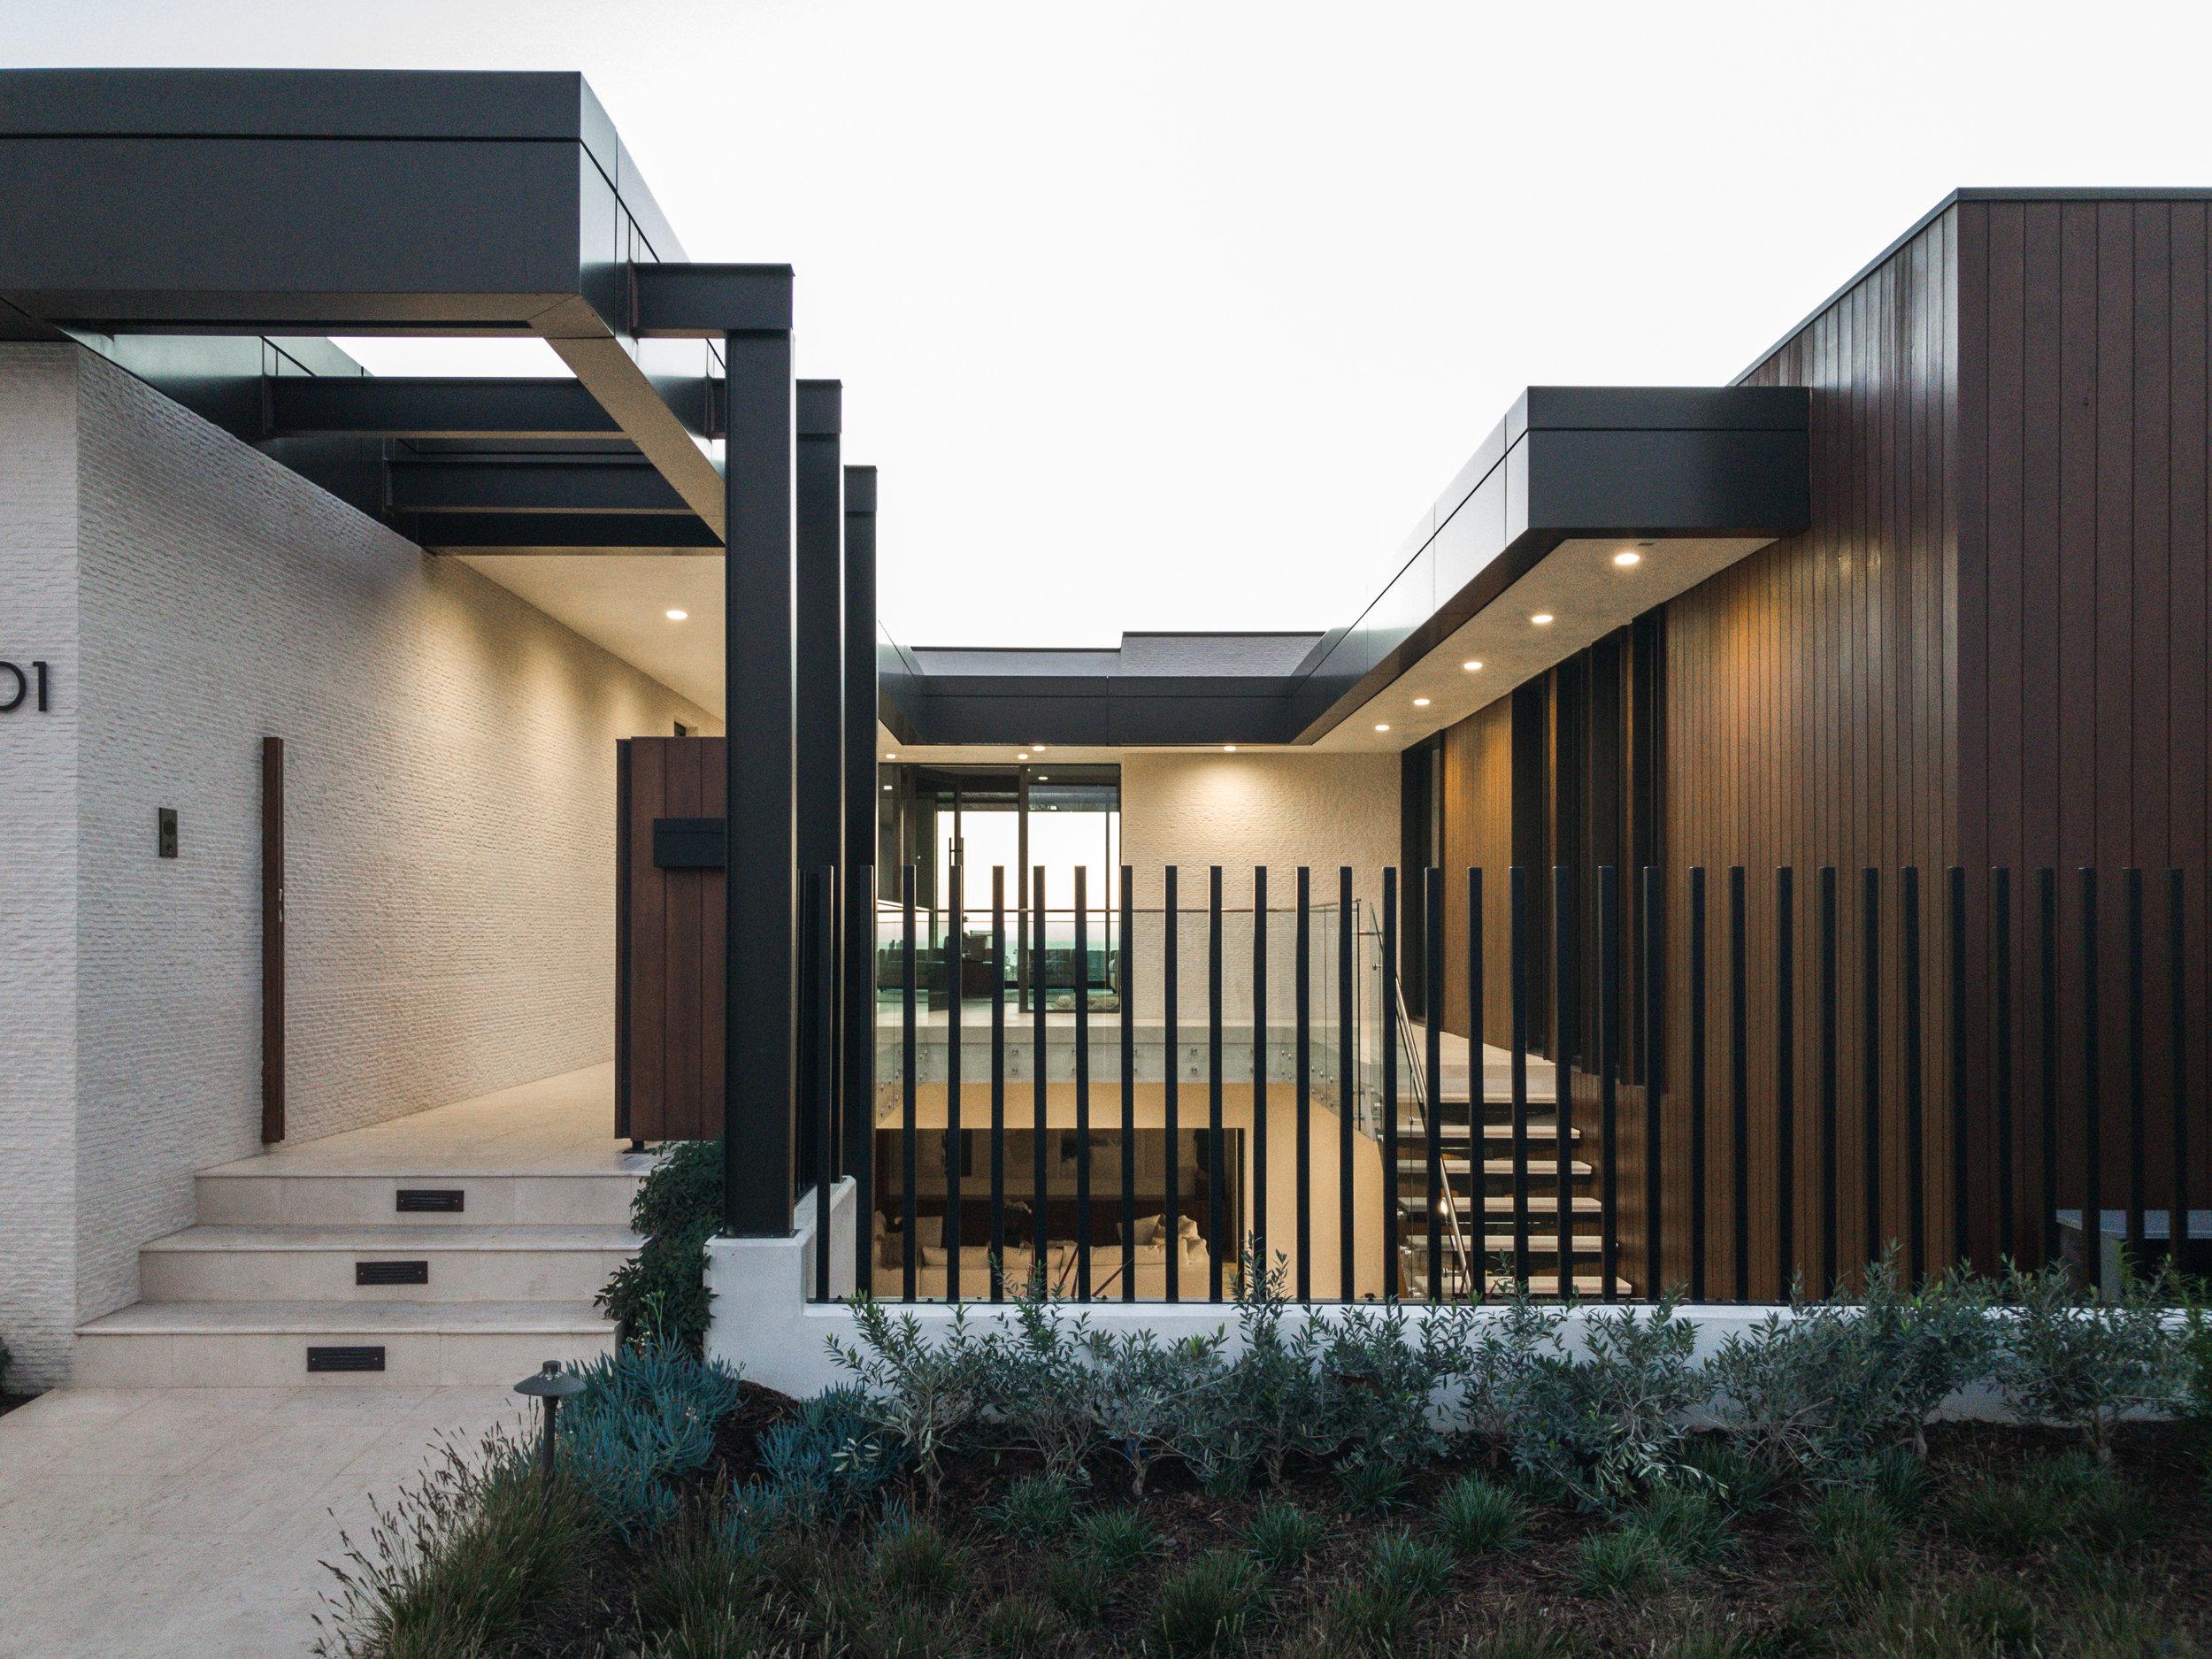 Architecture_2001_Tahuna_Corona_Del_Mar_David_Davidson-88.jpg